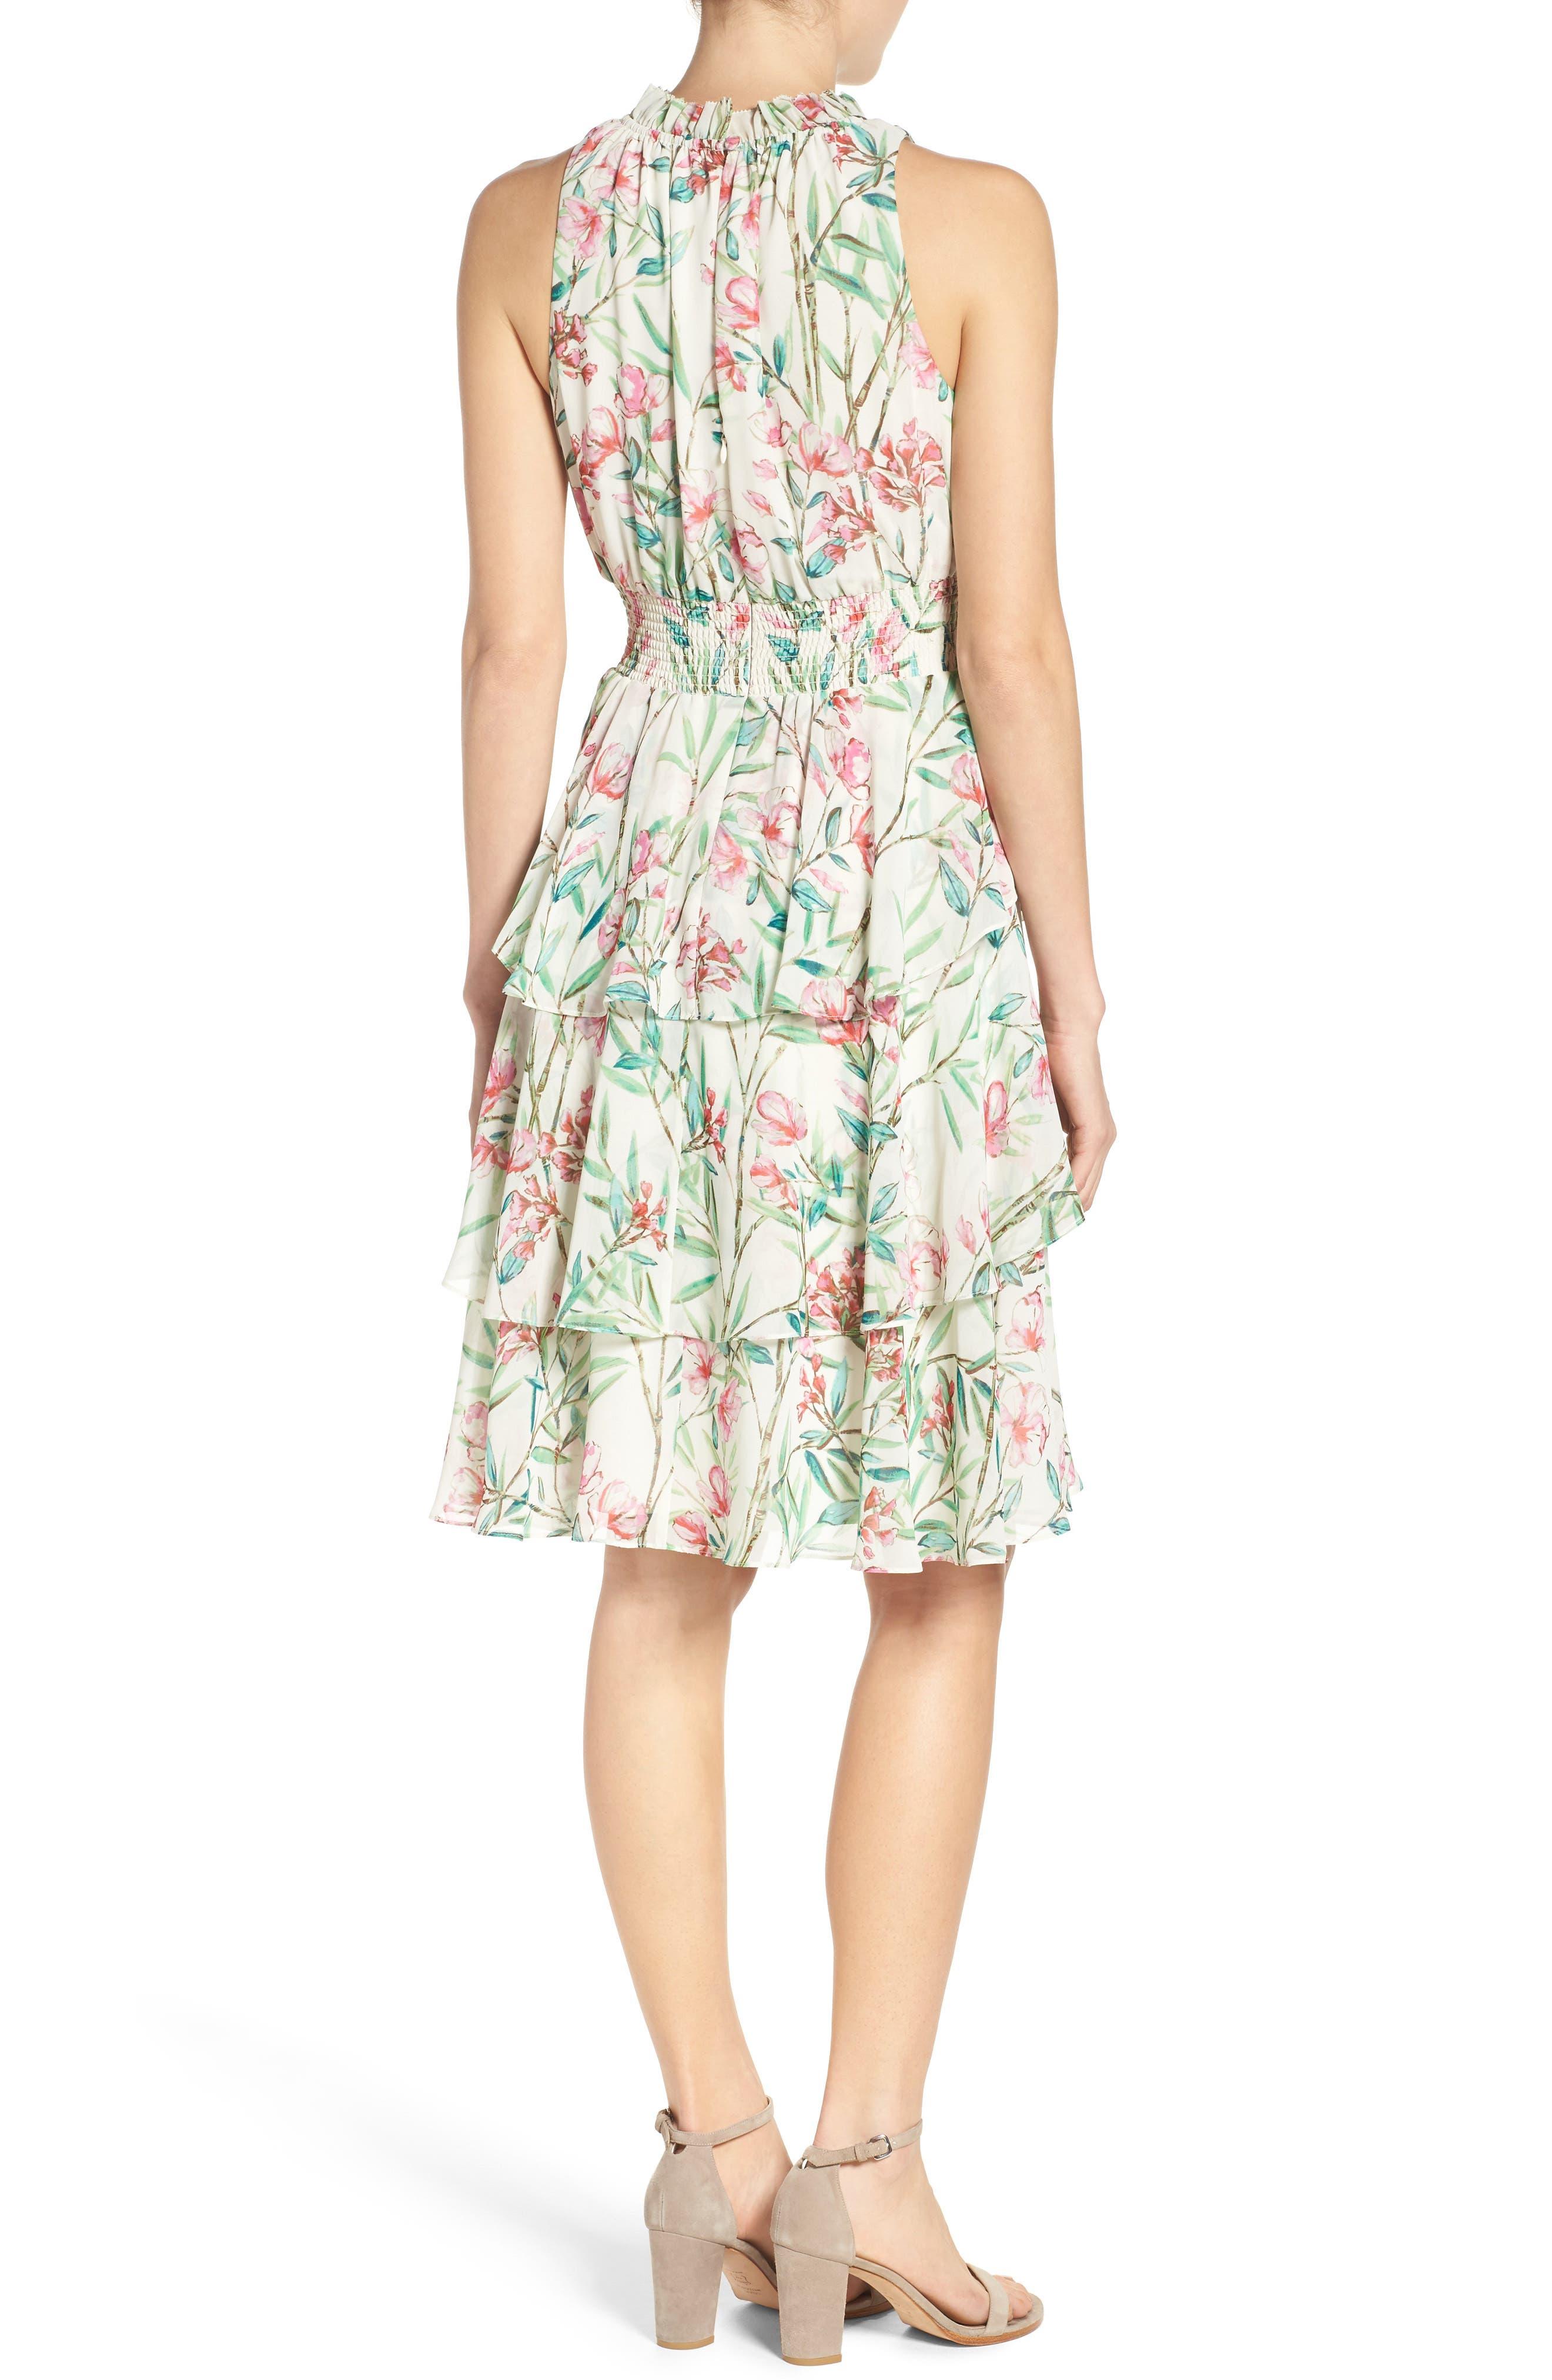 ELIZA J, Chiffon Fit & Flare Dress, Alternate thumbnail 2, color, 901